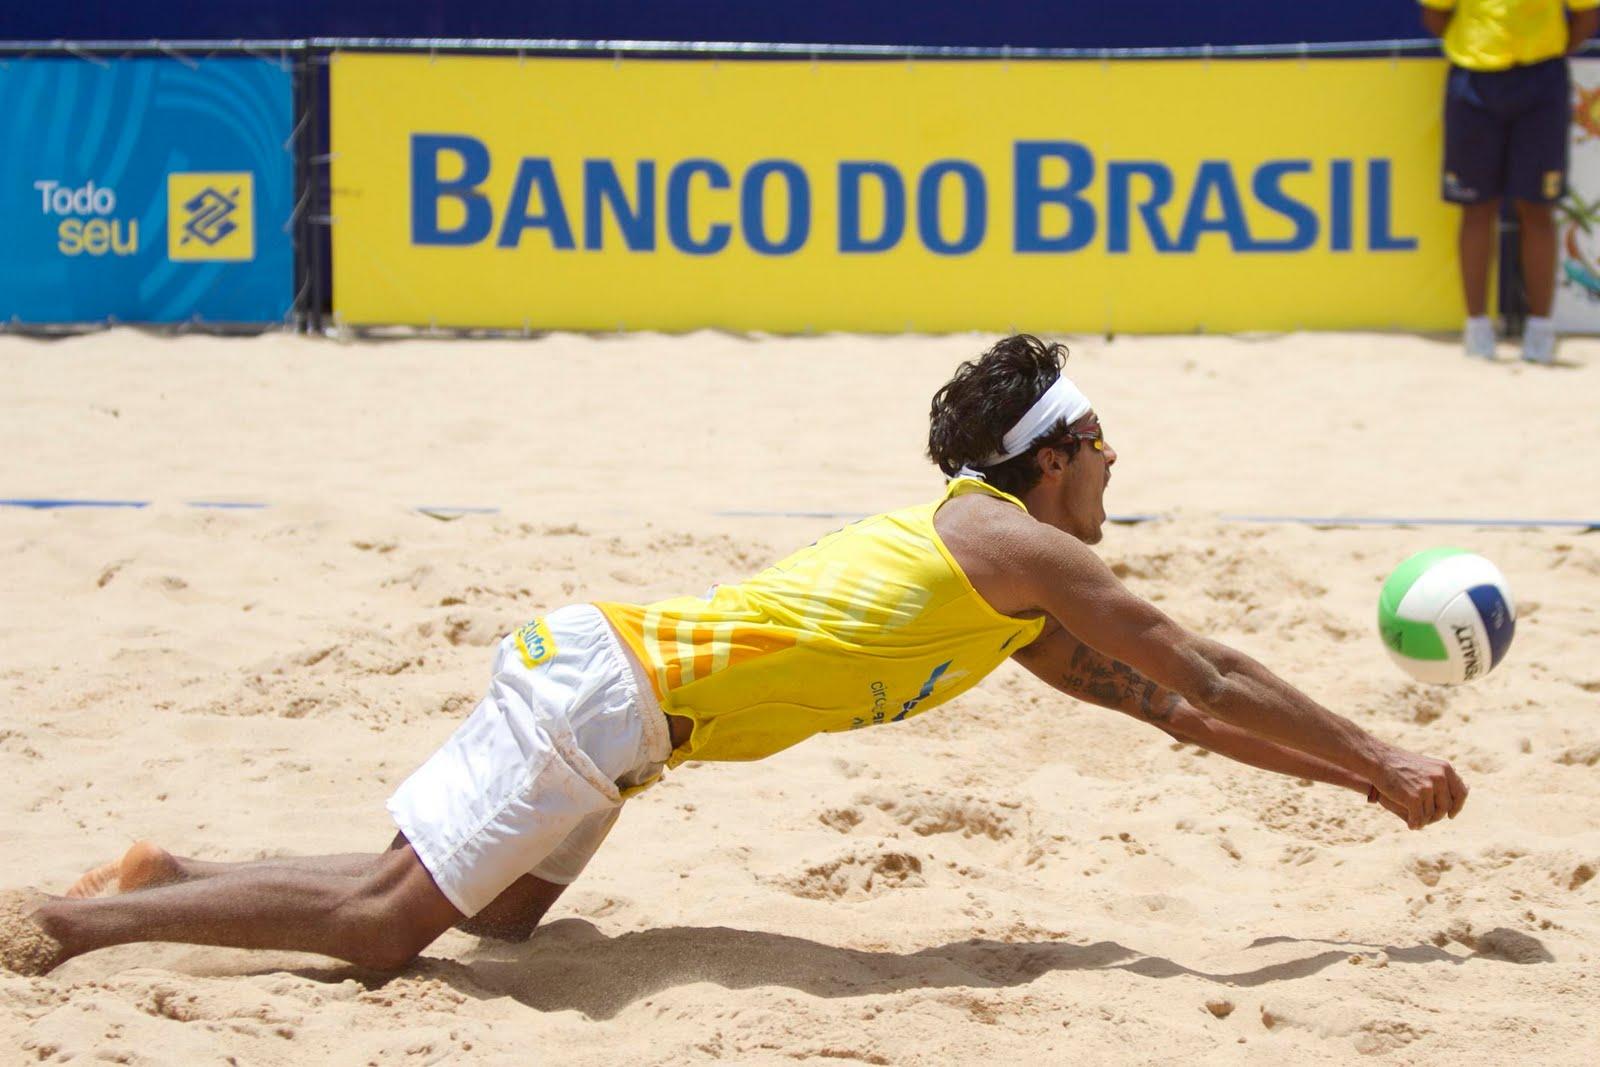 Circuito Banco Do Brasil 2017 : Fotos da etapa de joão pessoa do circuito banco brasil